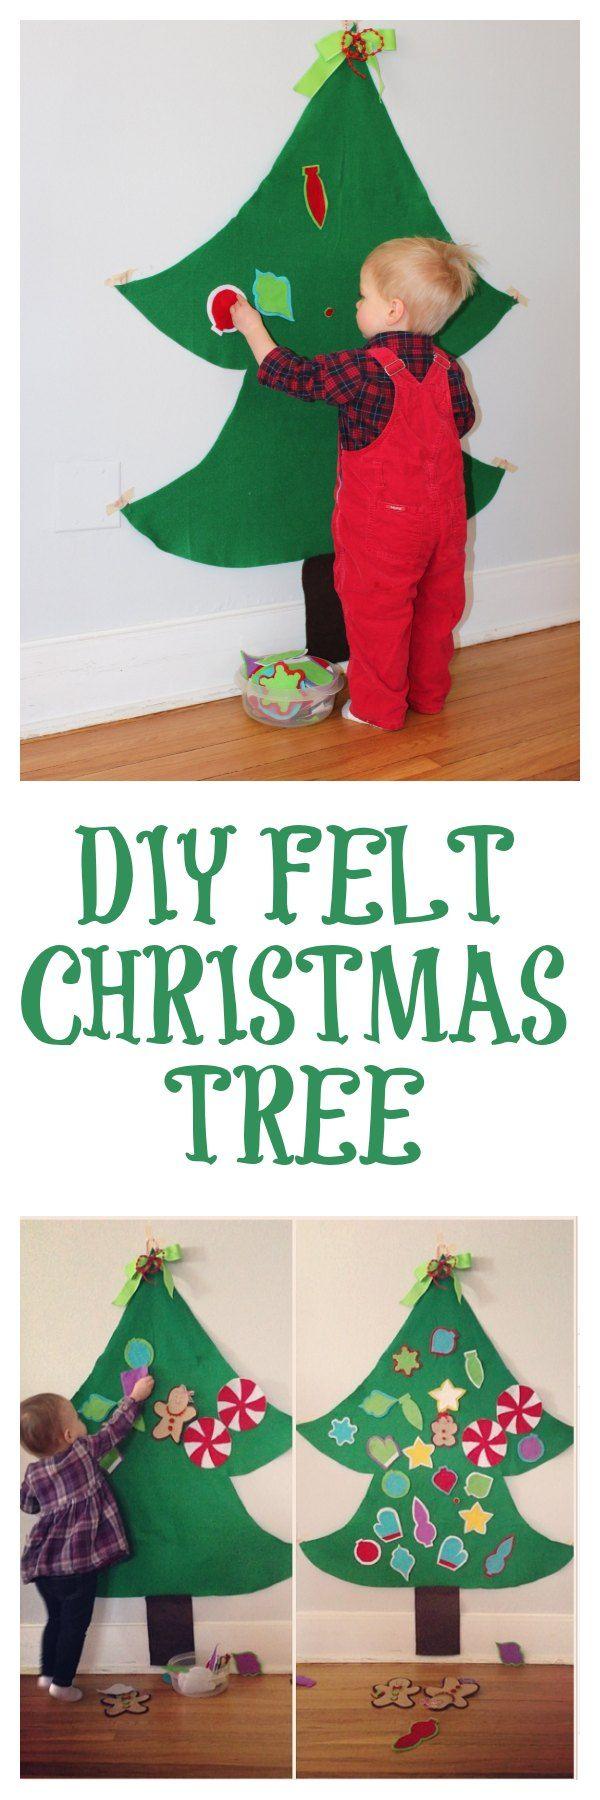 DIY Felt Christmas Tree Step-By-Step Tutorial - provides hours entertainment for kiddos!